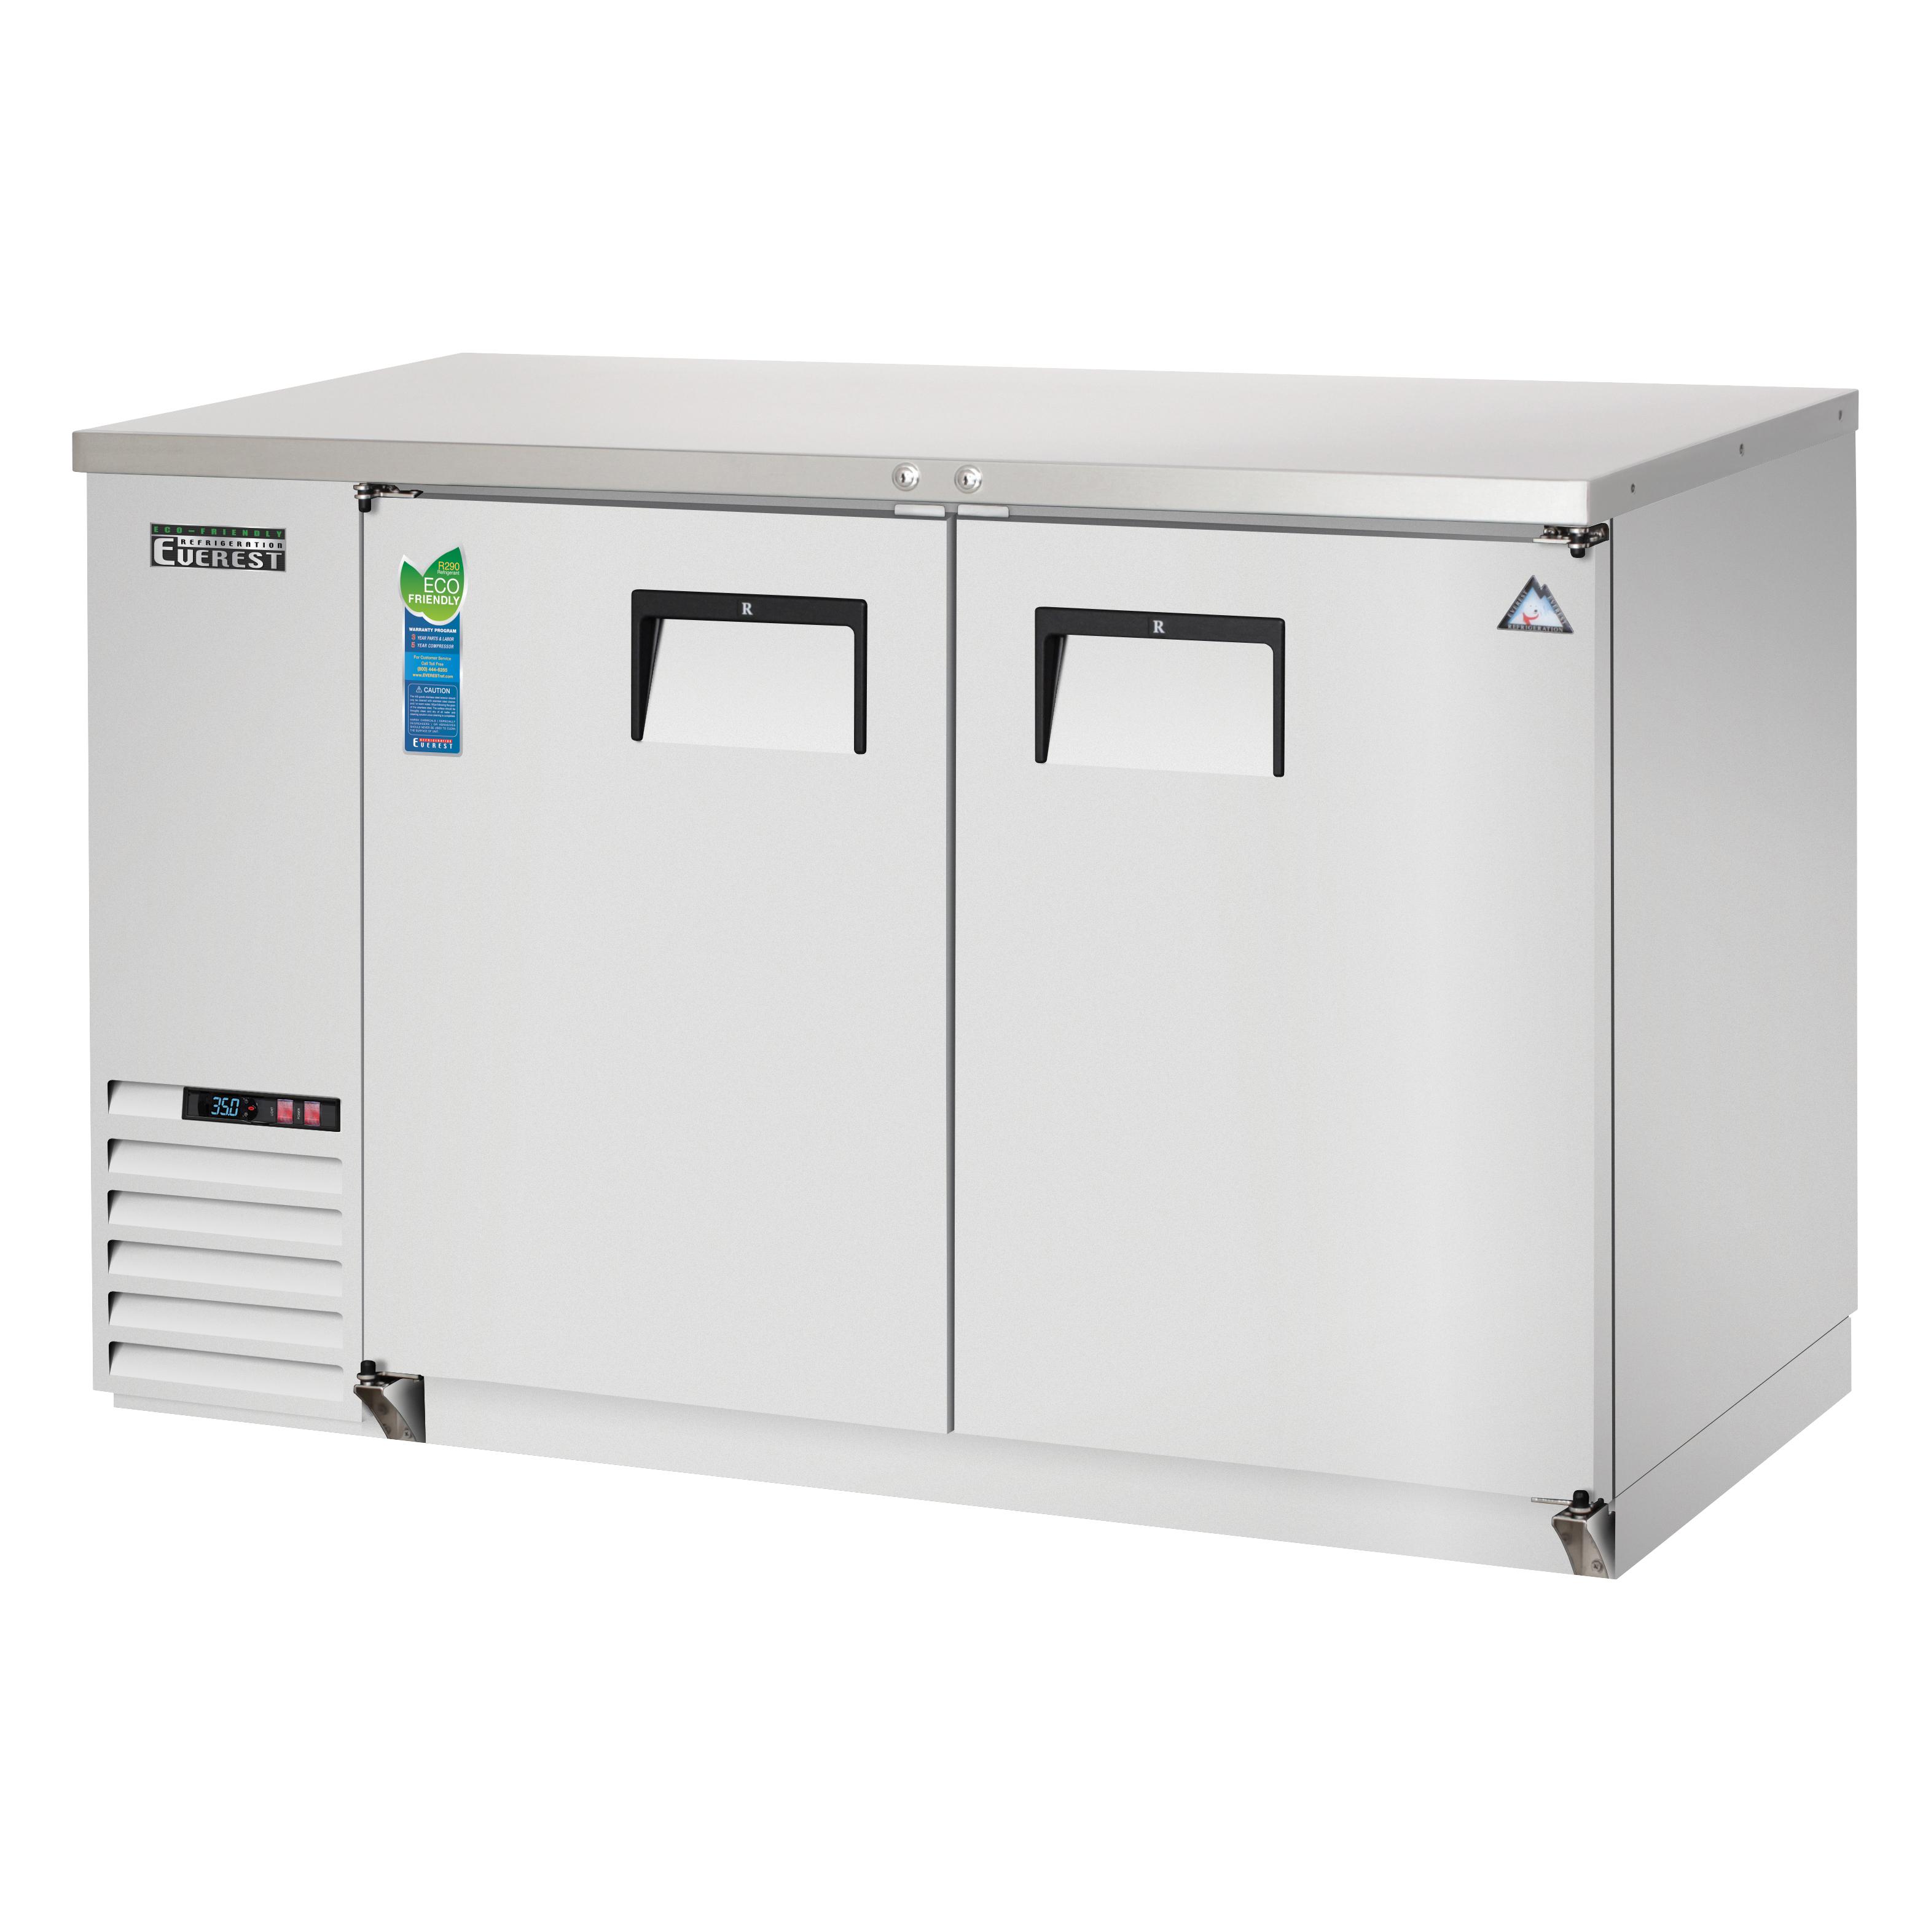 Everest Refrigeration EBB48-SS back bar cabinet, refrigerated